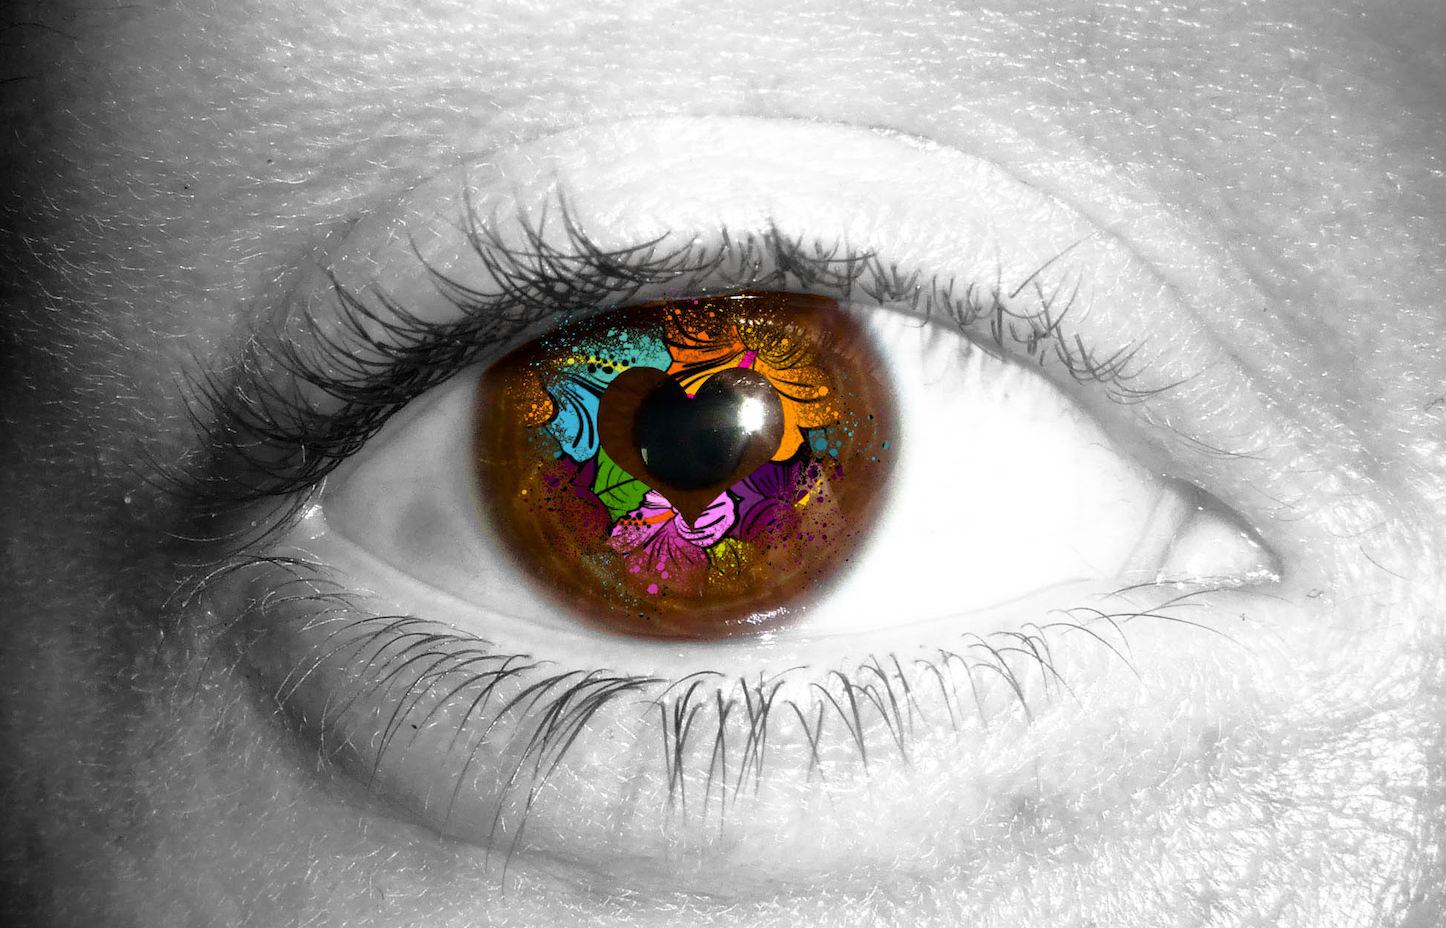 Eyes-Iris-Scanning-Capabilities-Coming-To-iPhone9.jpg